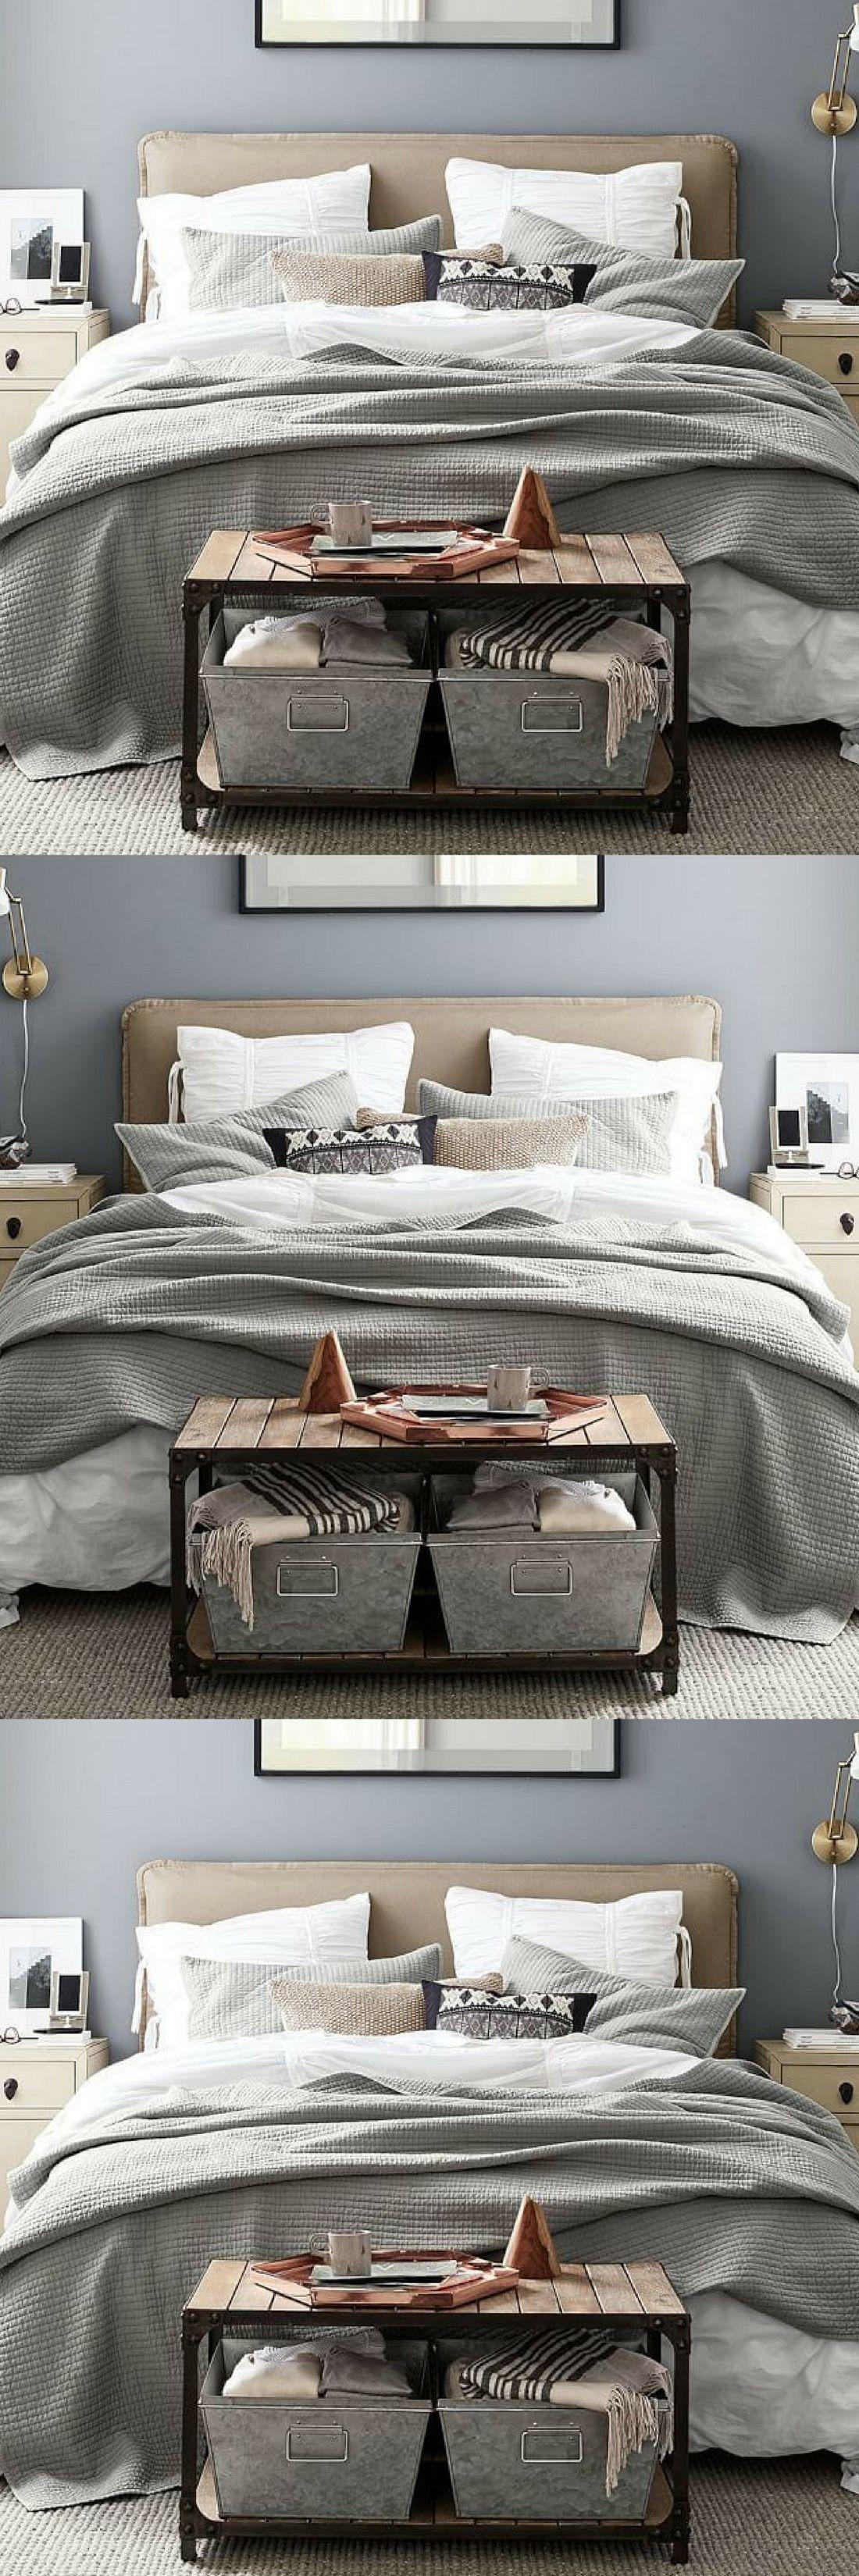 slipcover slipcovered project rooms holly hgtv covered design an headboard step slip easy bedrooms make mathis